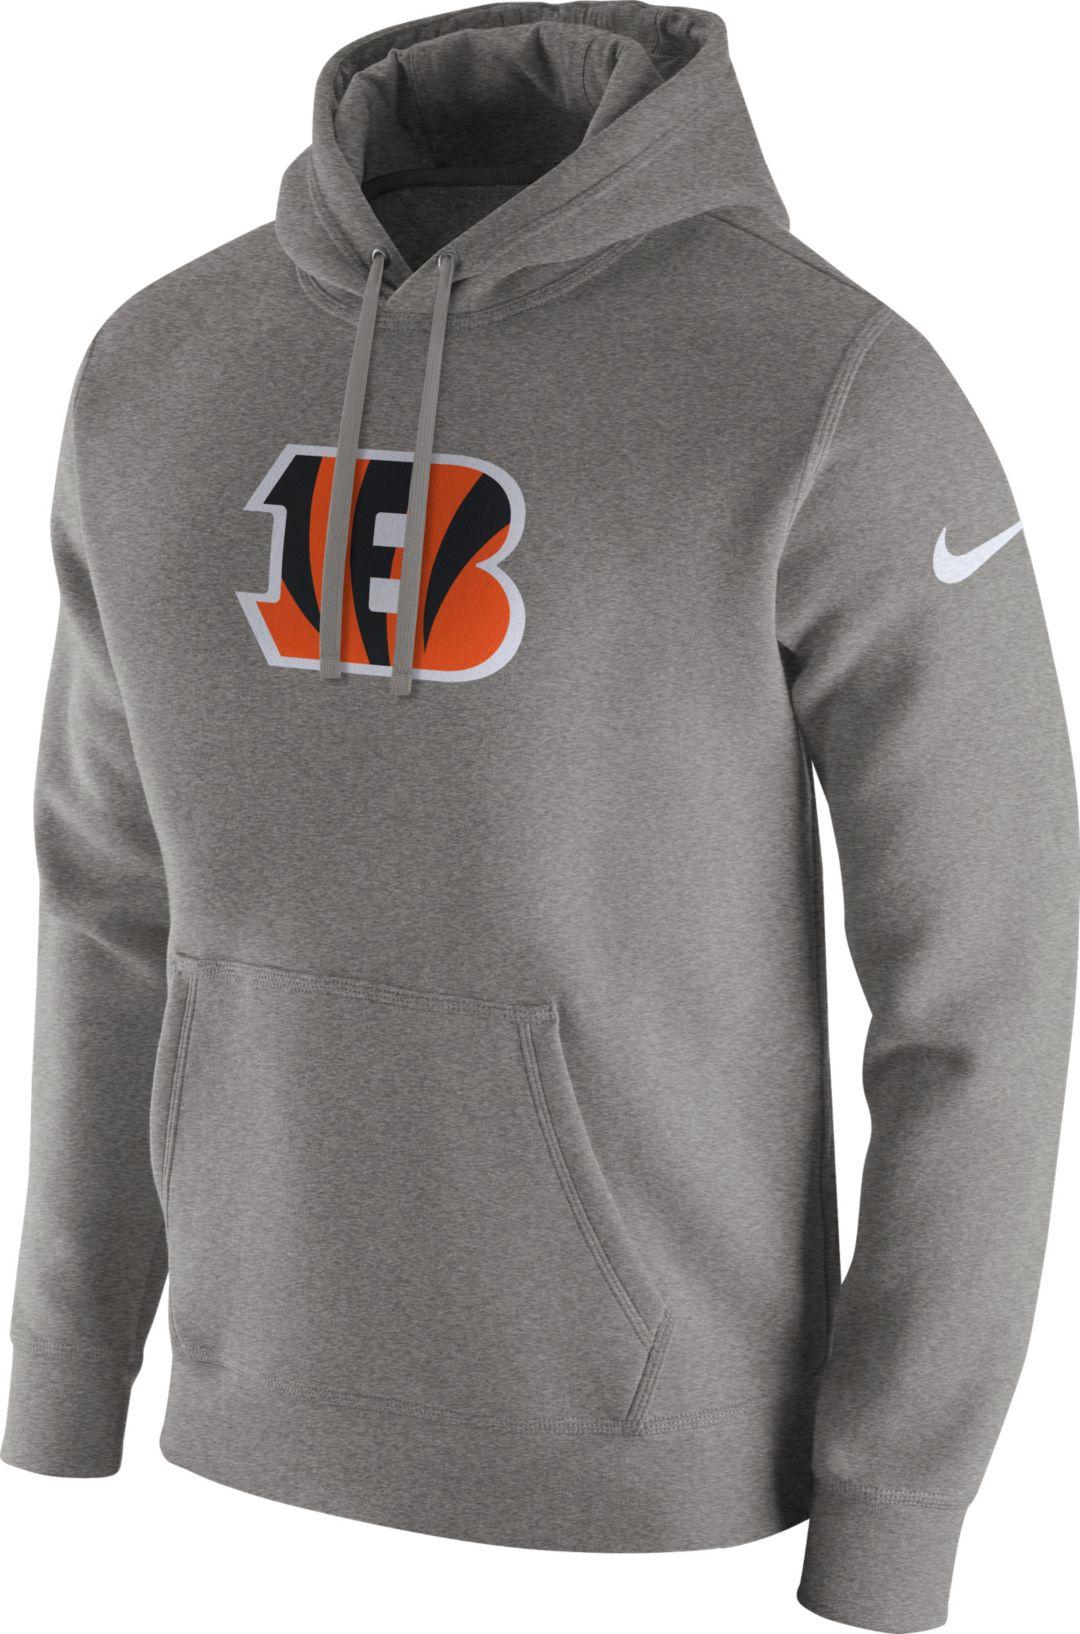 38e9d653 Nike Men's Cincinnati Bengals Logo Club Grey Hoodie